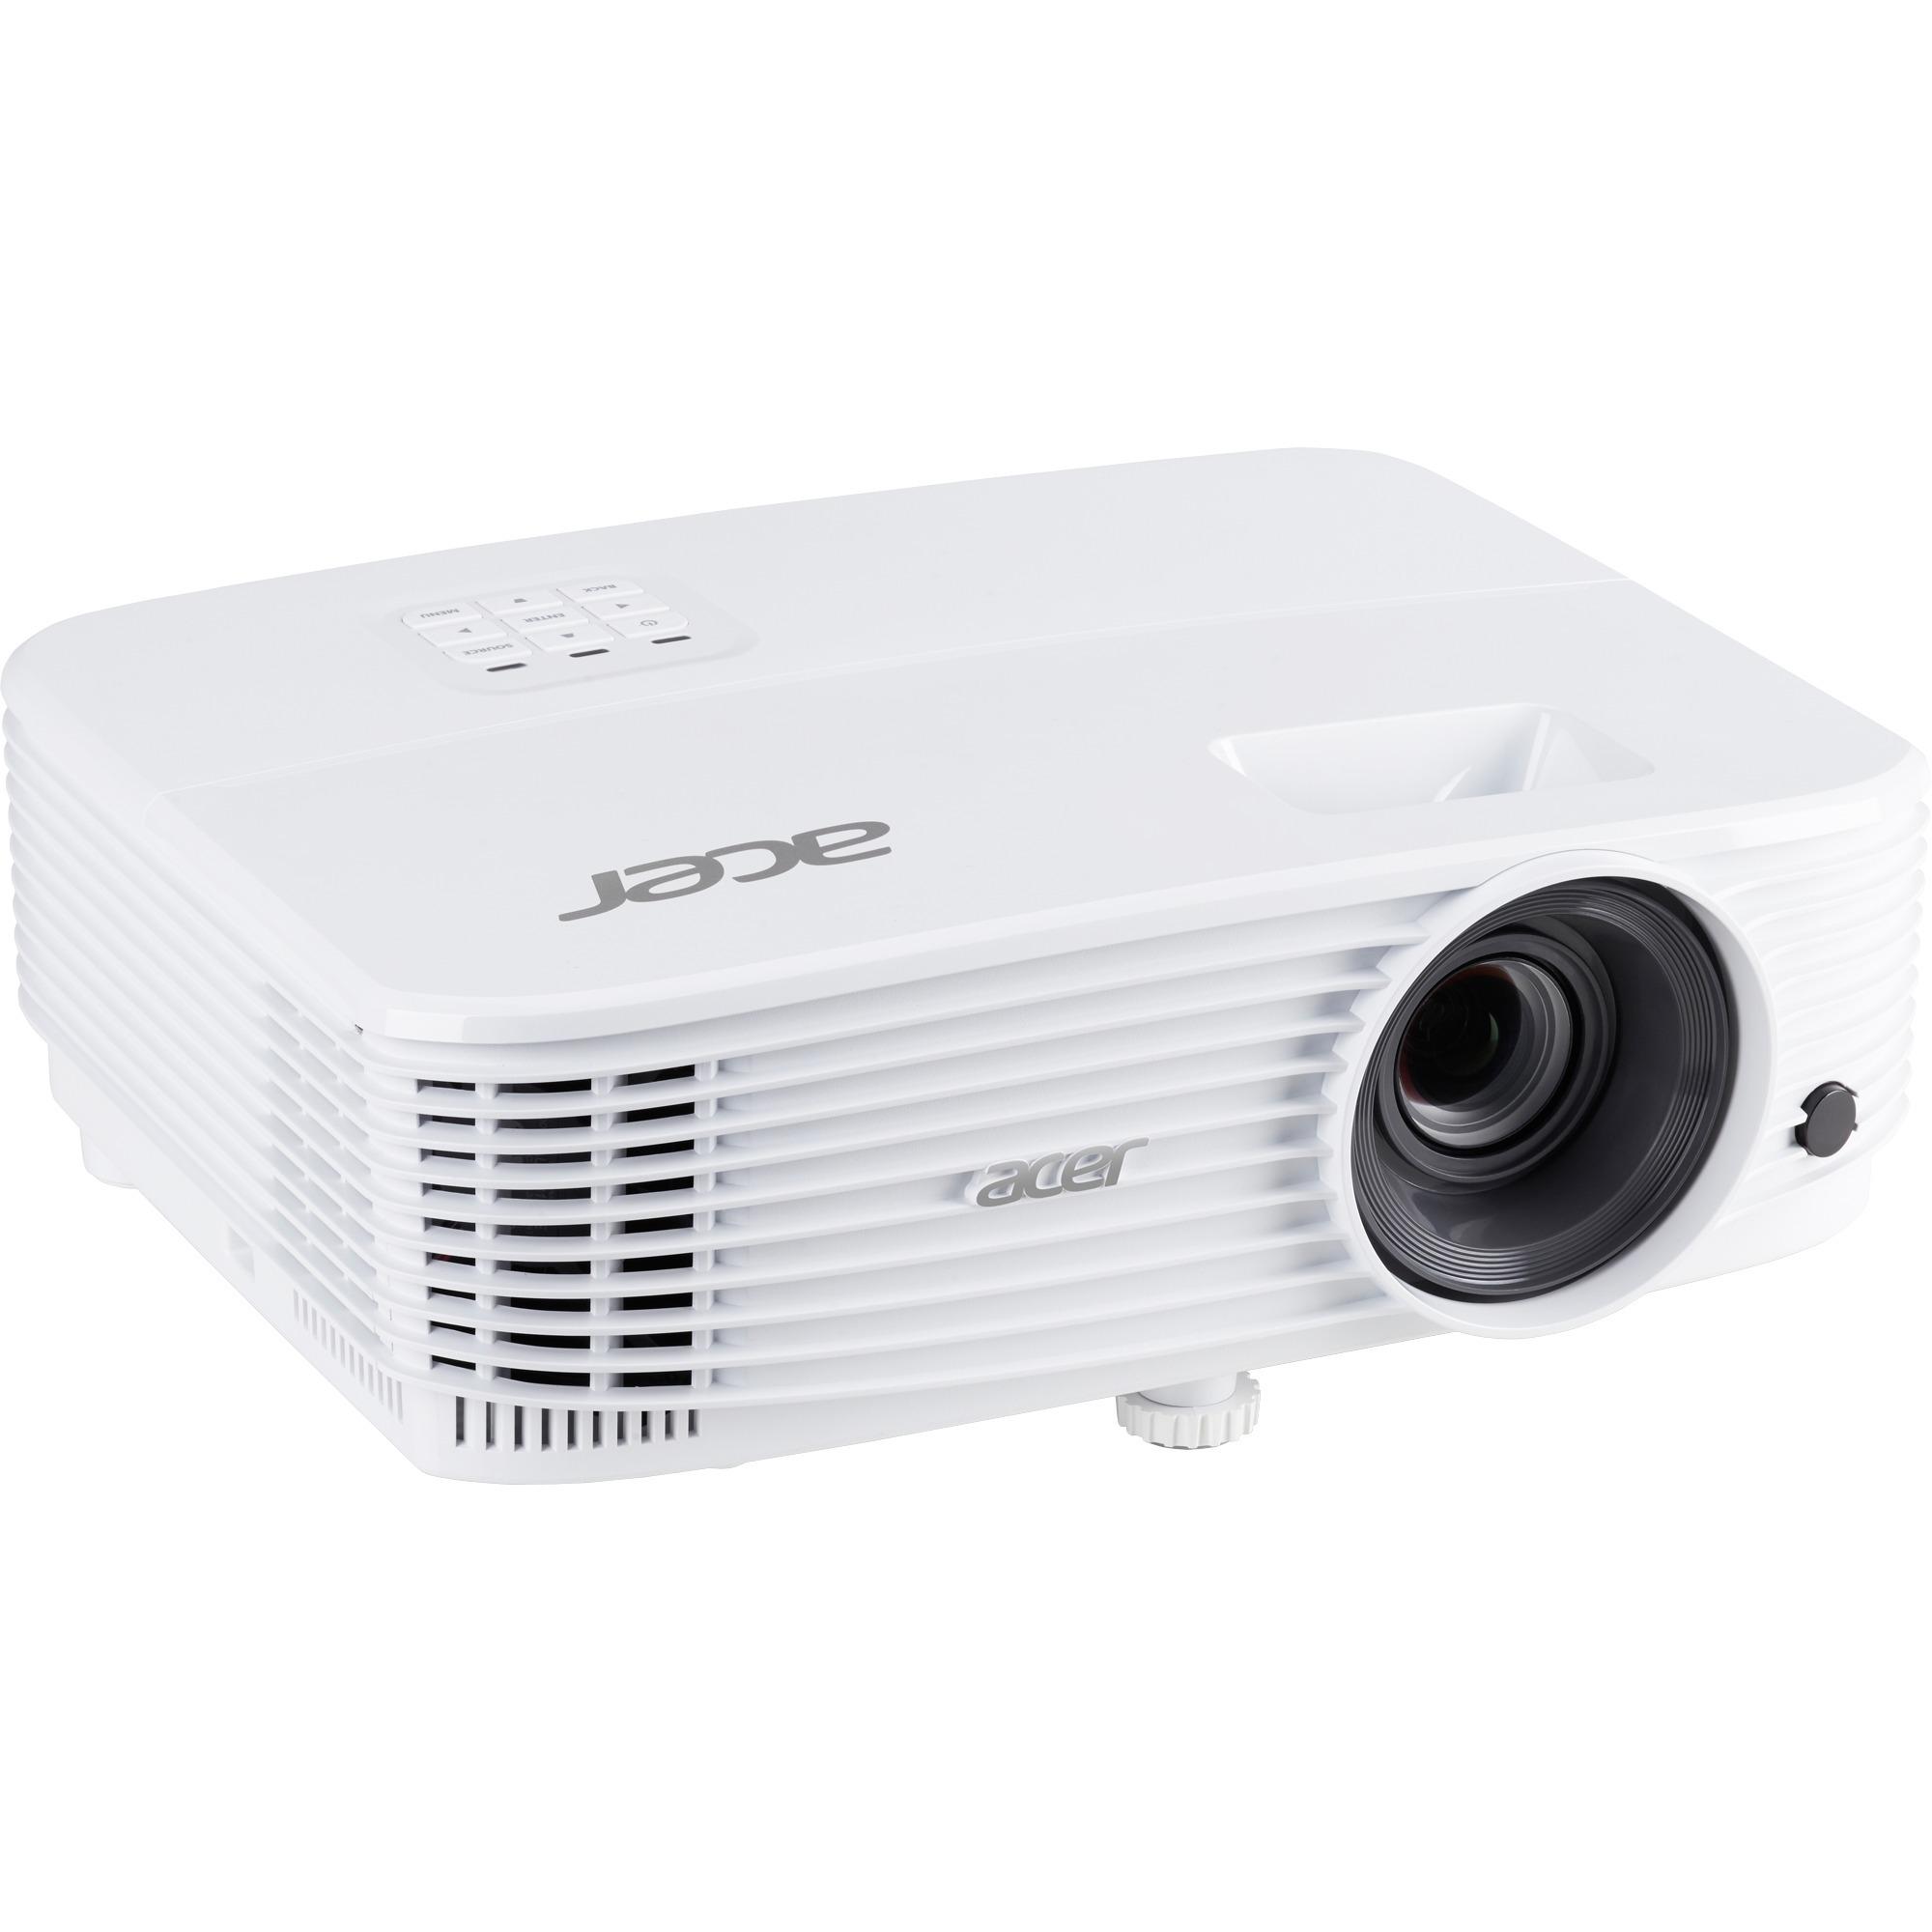 P1150 videoproiettore 3600 ANSI lumen DLP SVGA (800x600) Compatibilit� 3D Proiettore portatile Bianco, Proiettore DLP